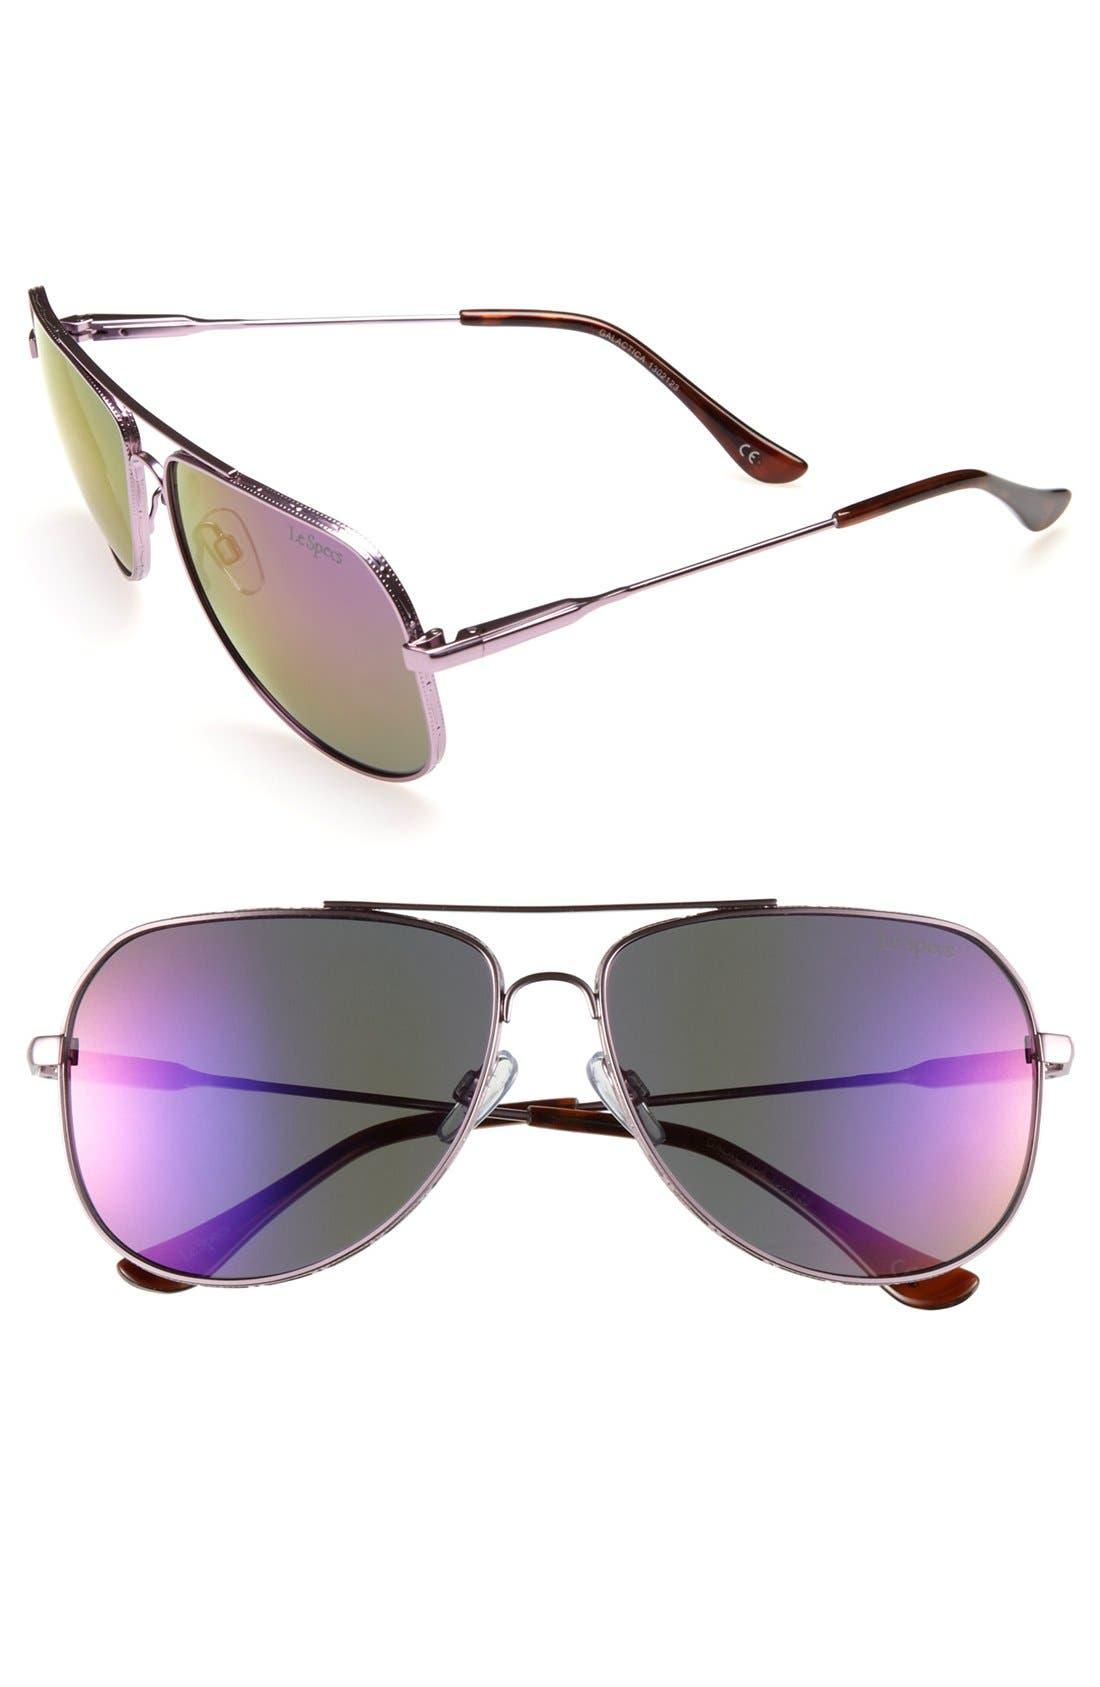 Main Image - Le Specs 'Galactica' Aviator Sunglasses